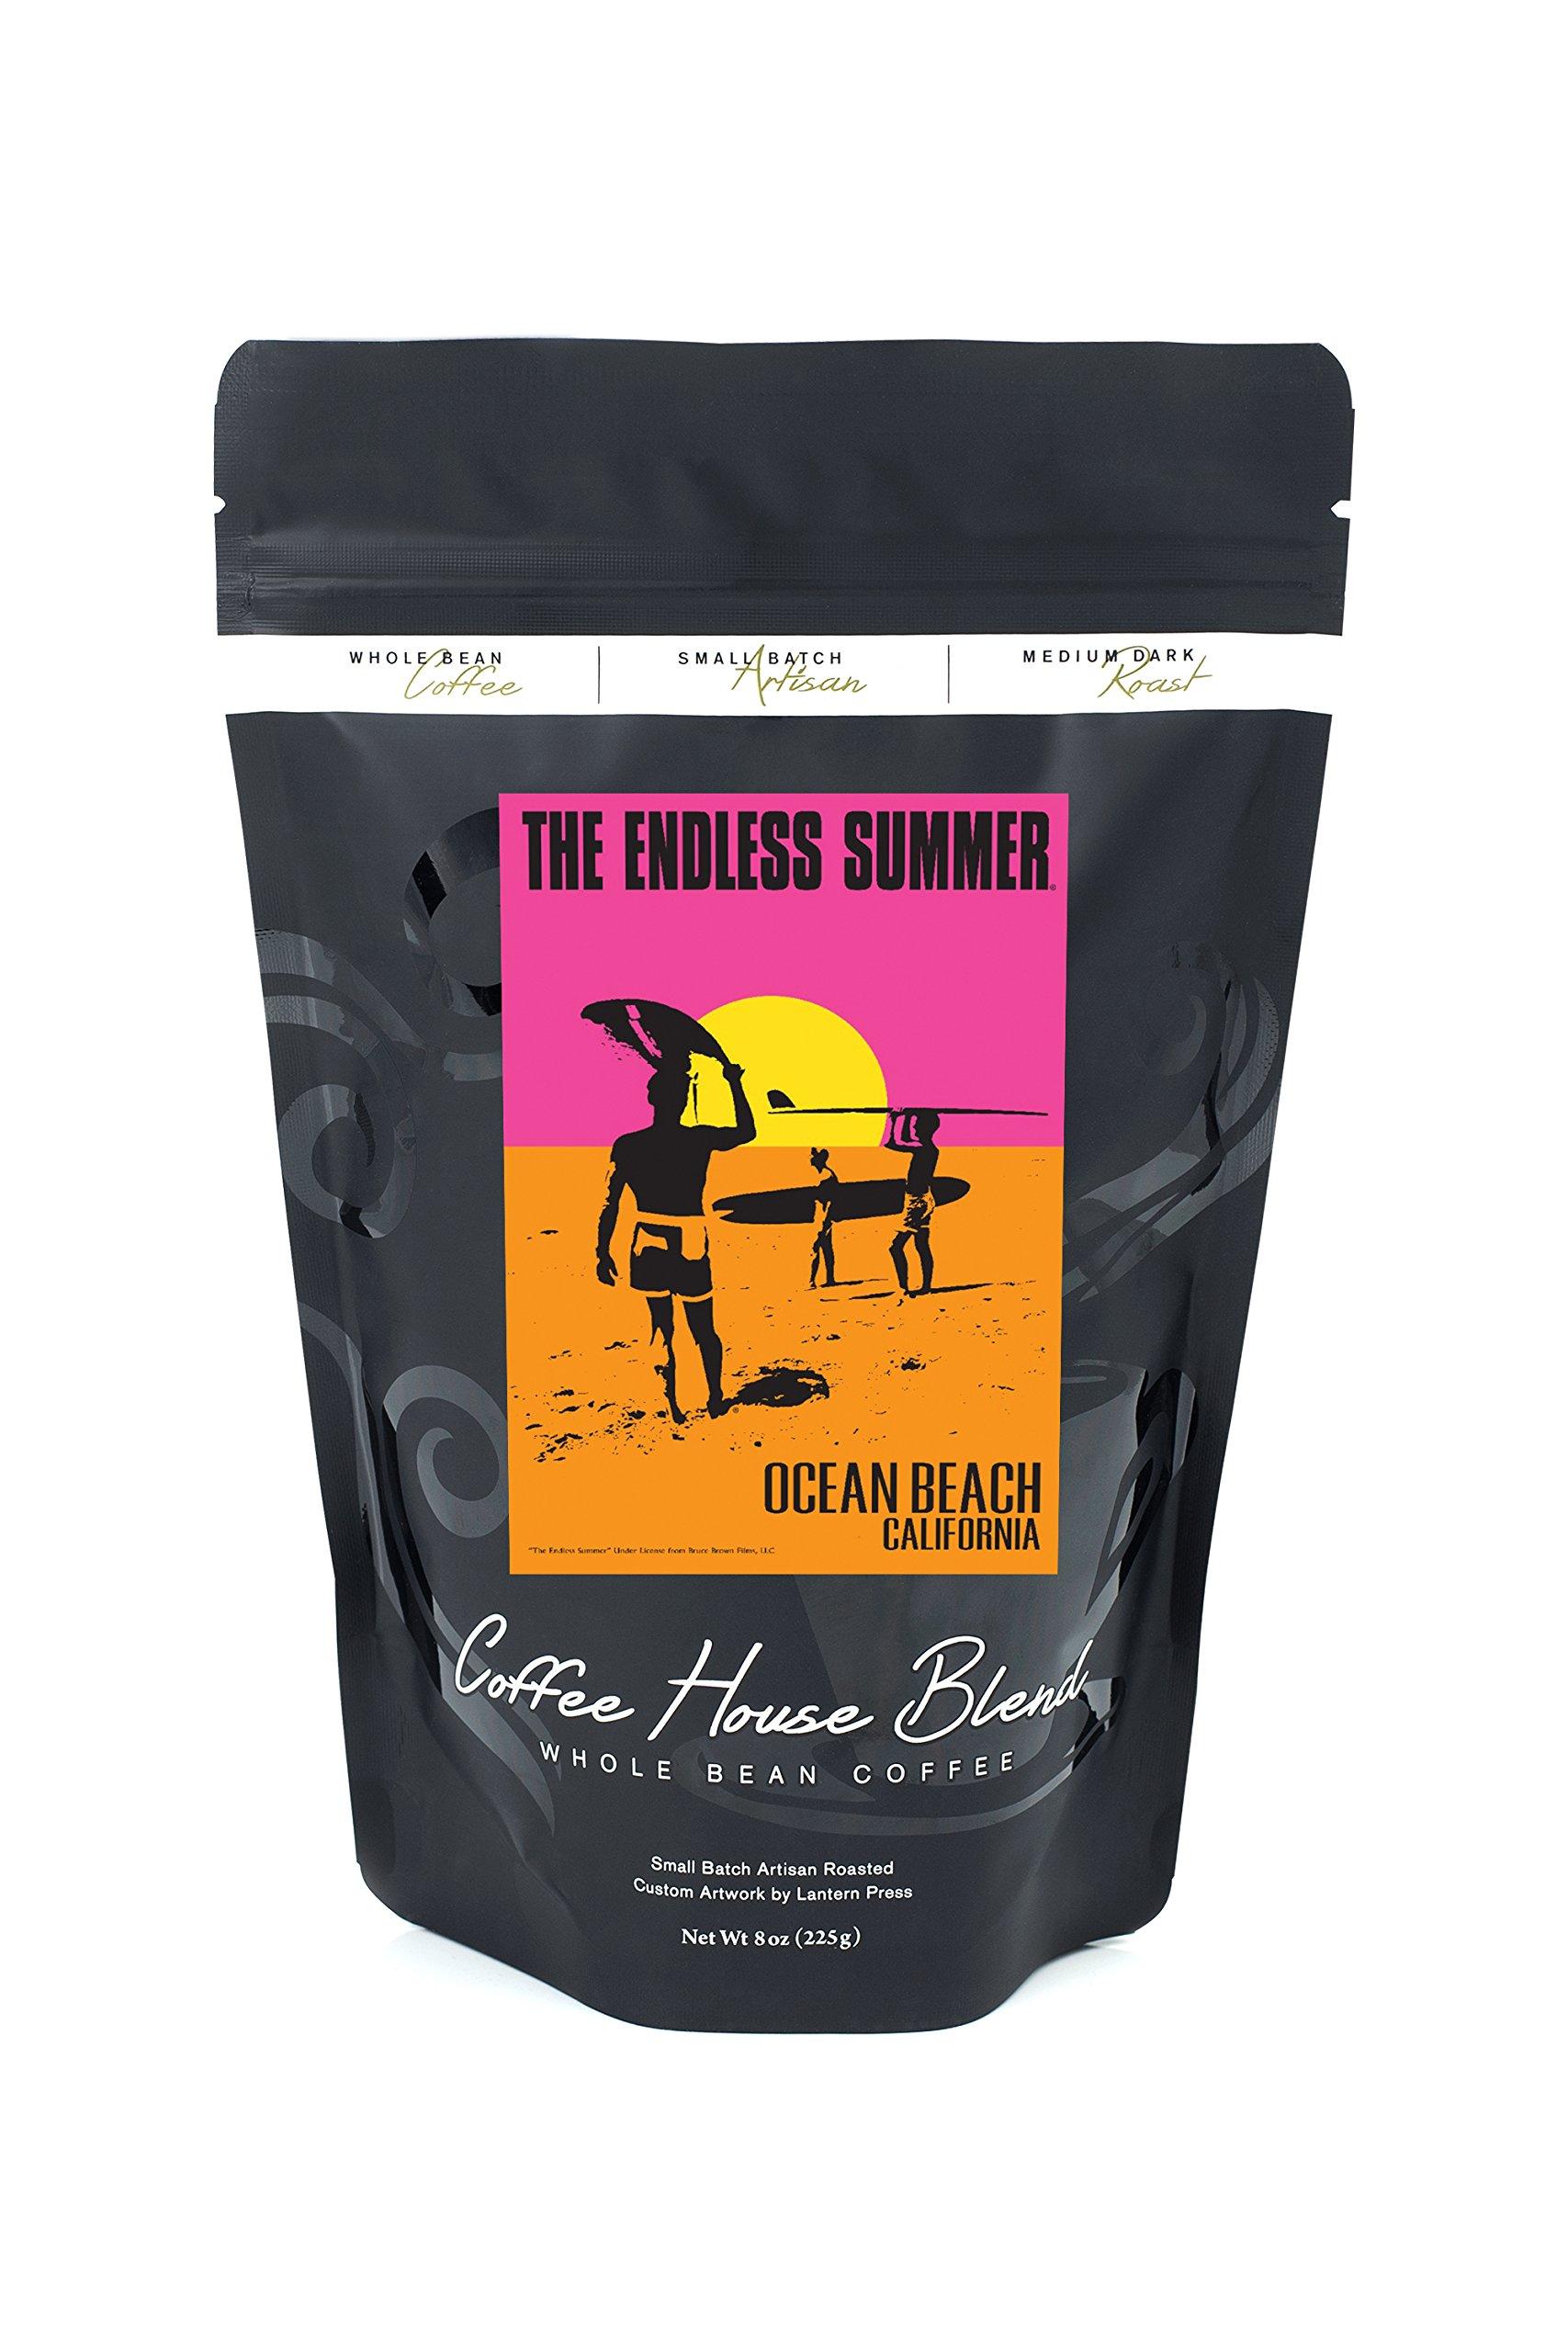 Ocean Beach, California - The Endless Summer - Original Movie Poster (8oz Whole Bean Small Batch Artisan Coffee - Bold & Strong Medium Dark Roast w/ Artwork)